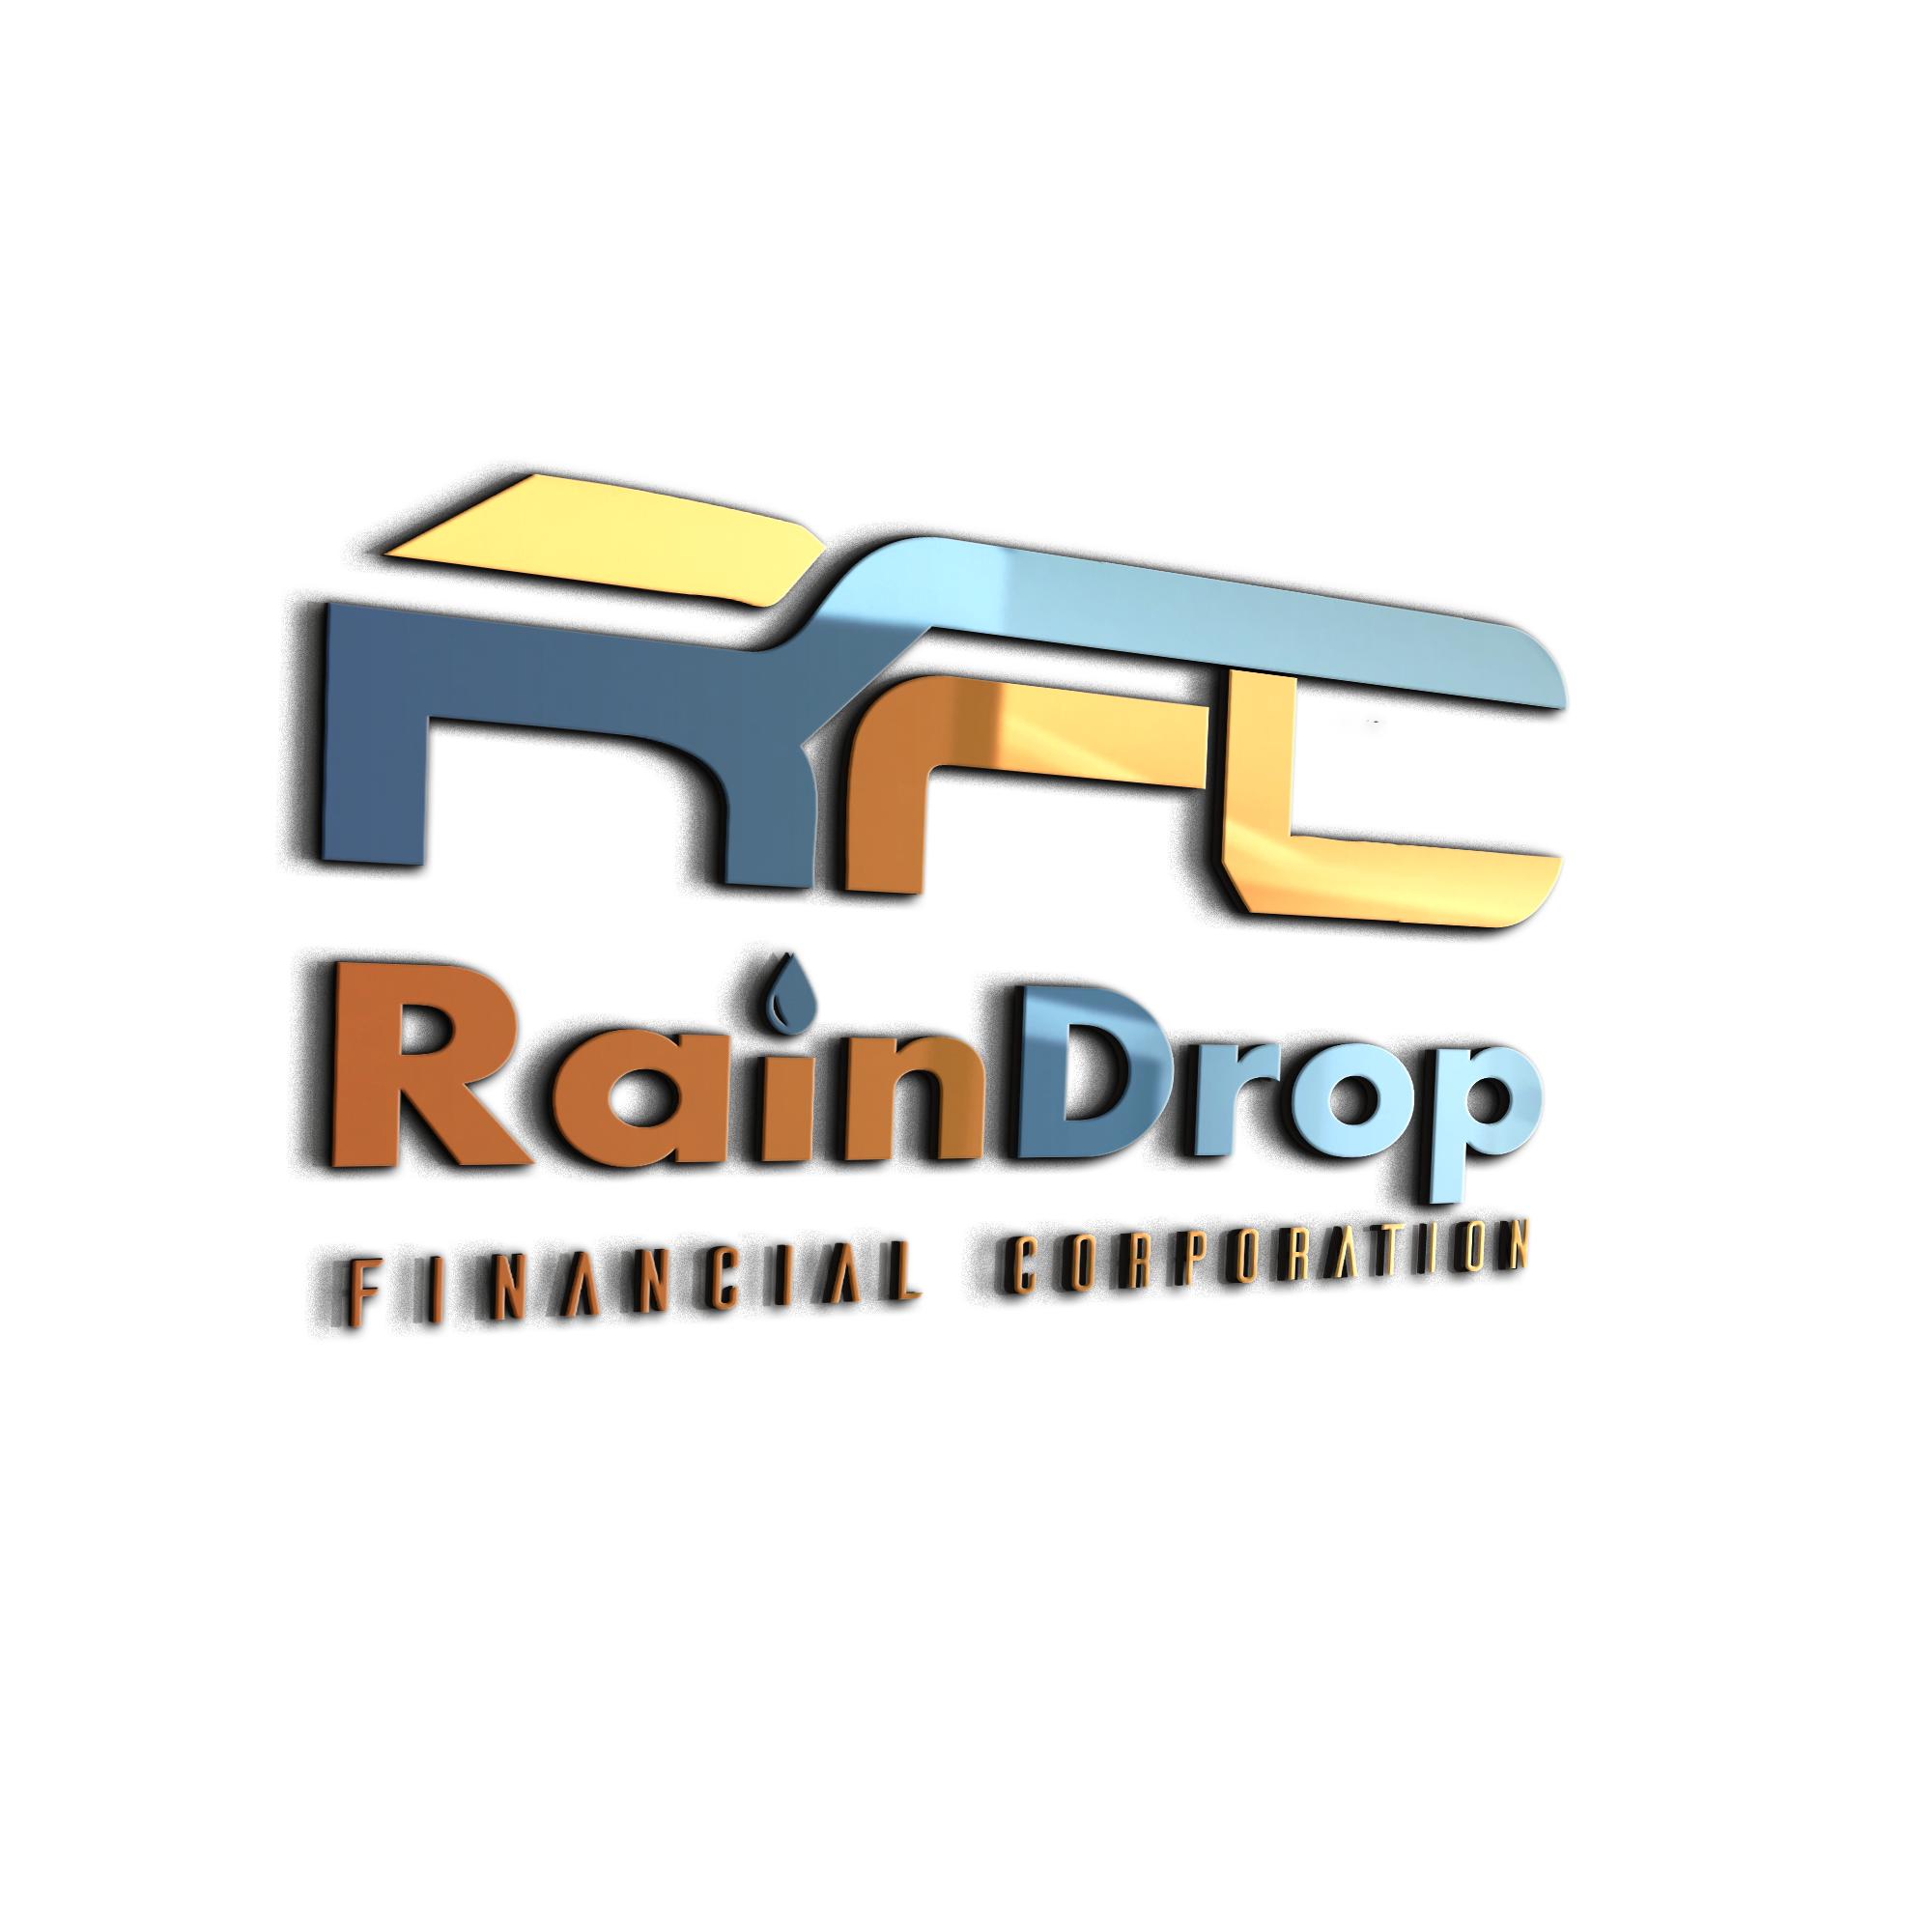 Raindrop Financial Corporation